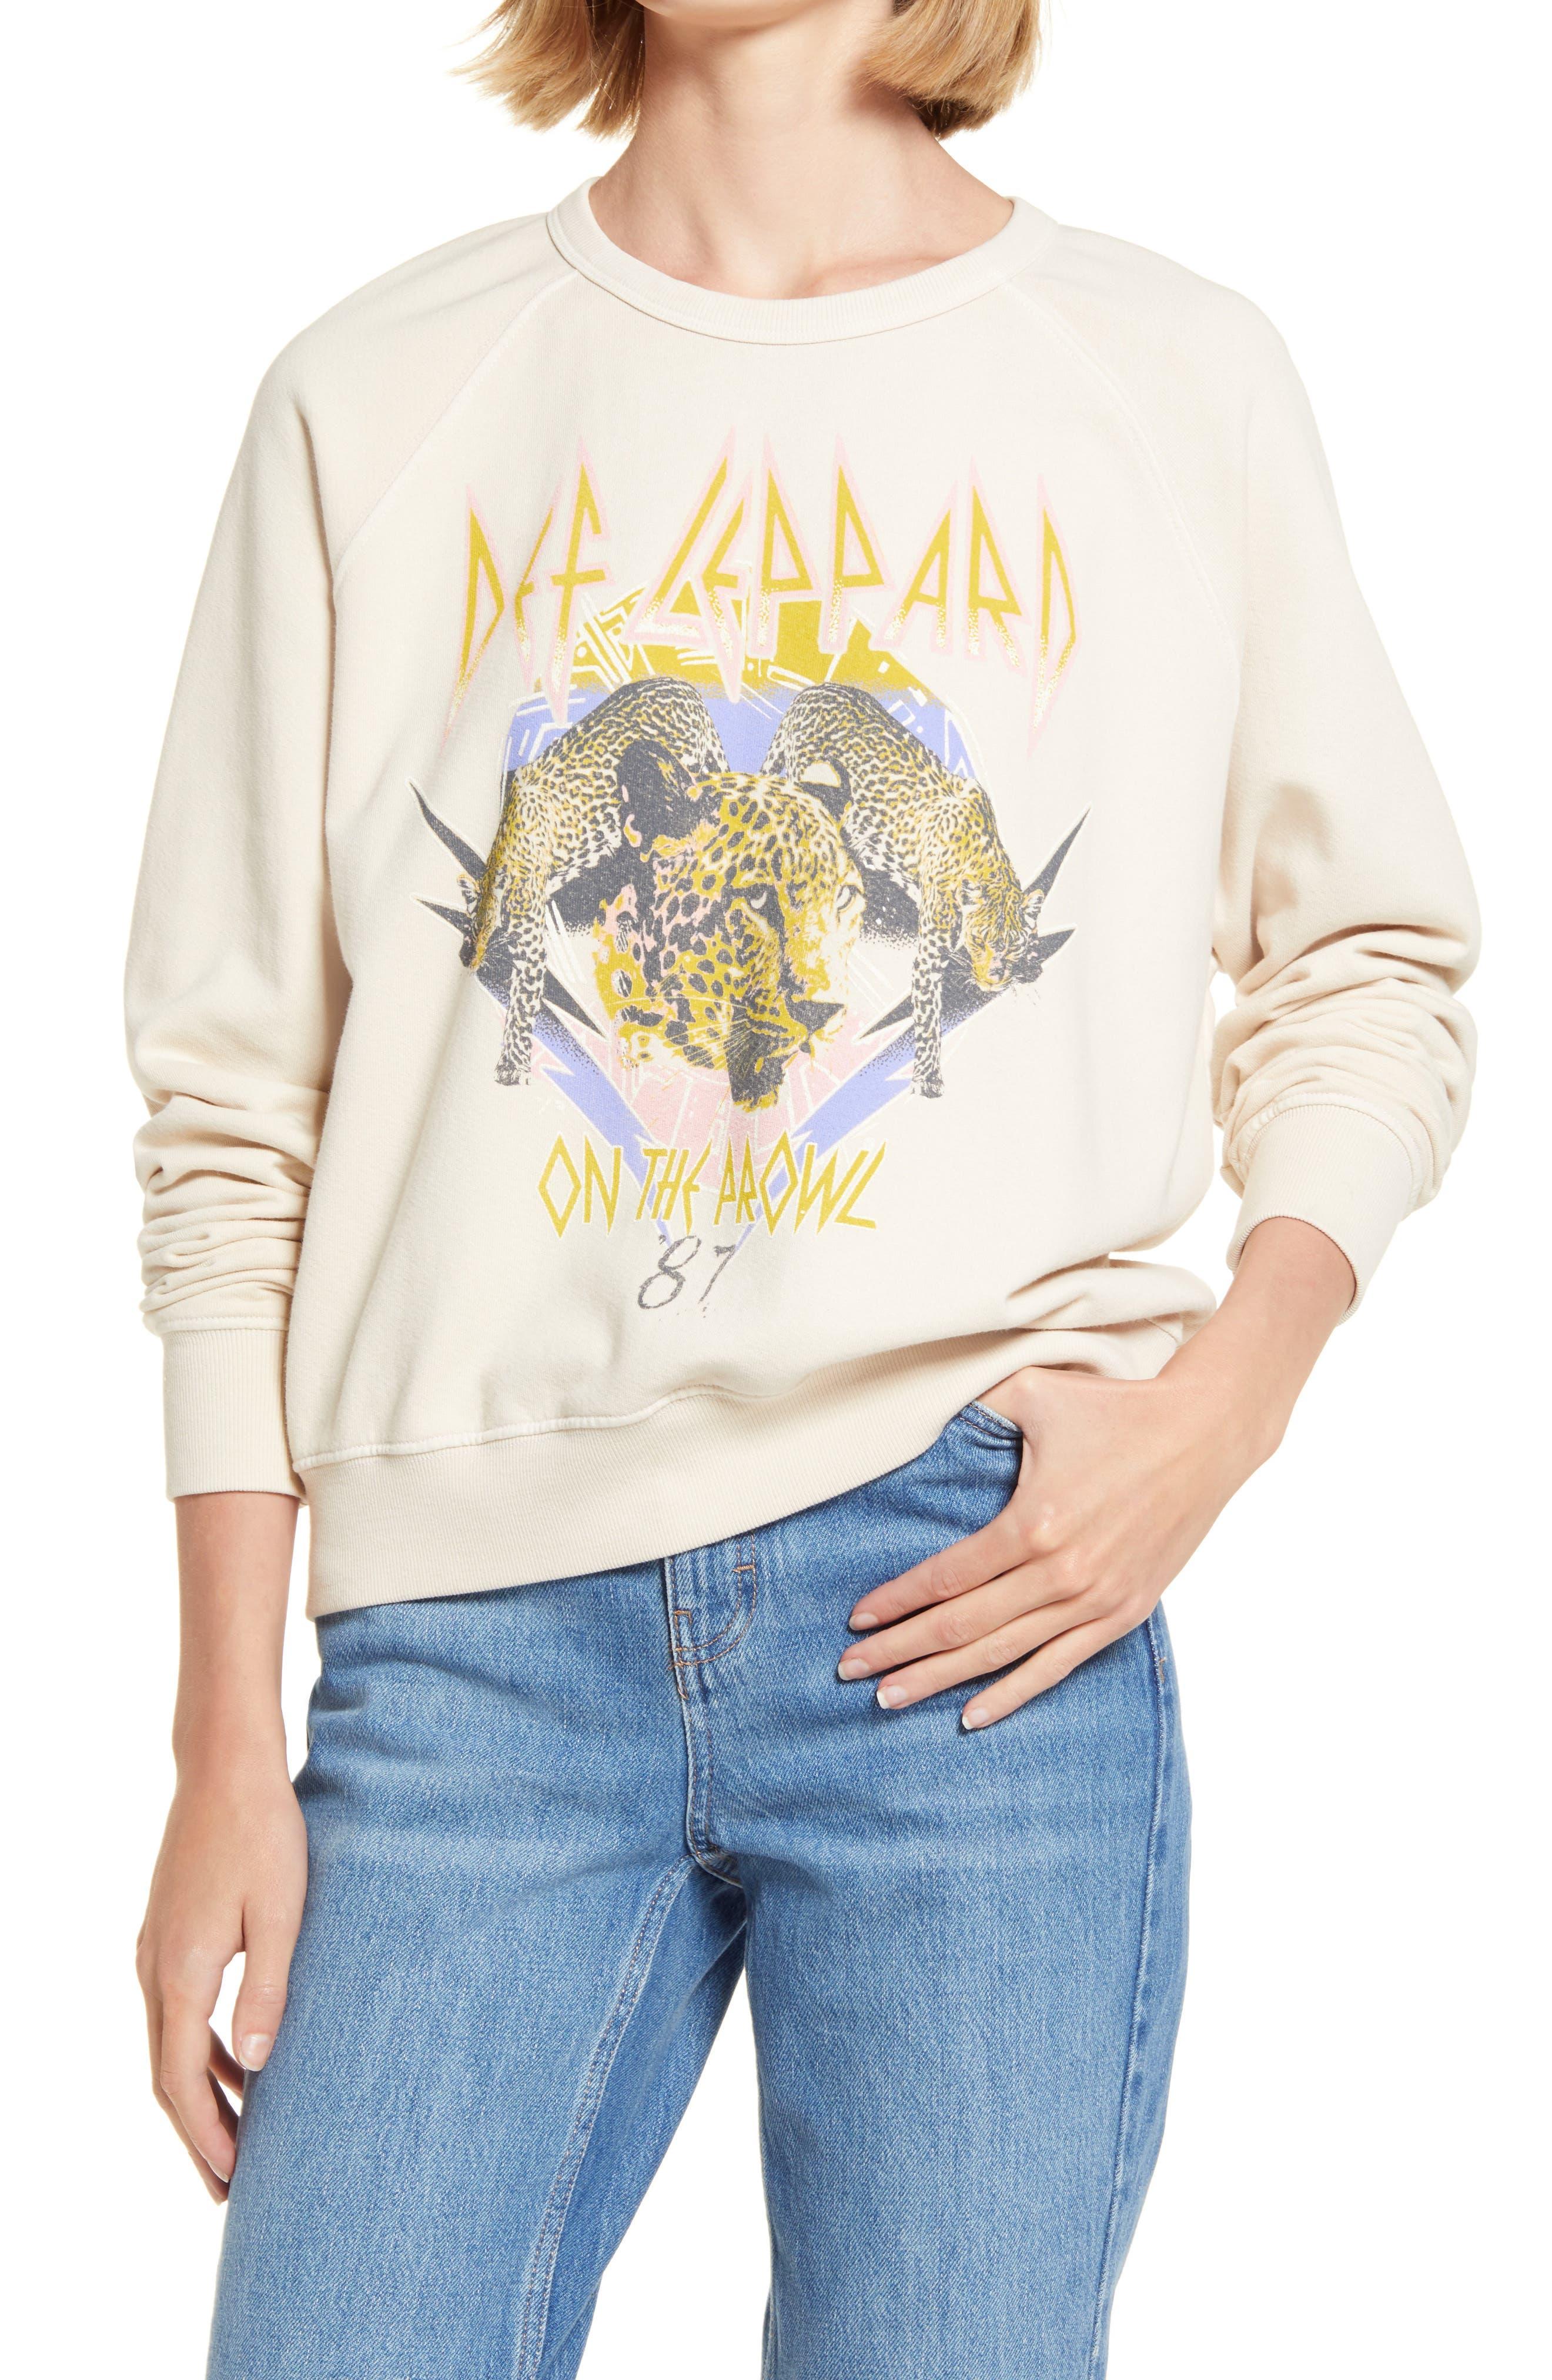 Daydreamer Def Leppard On the Prowl Sweatshirt | Nordstrom